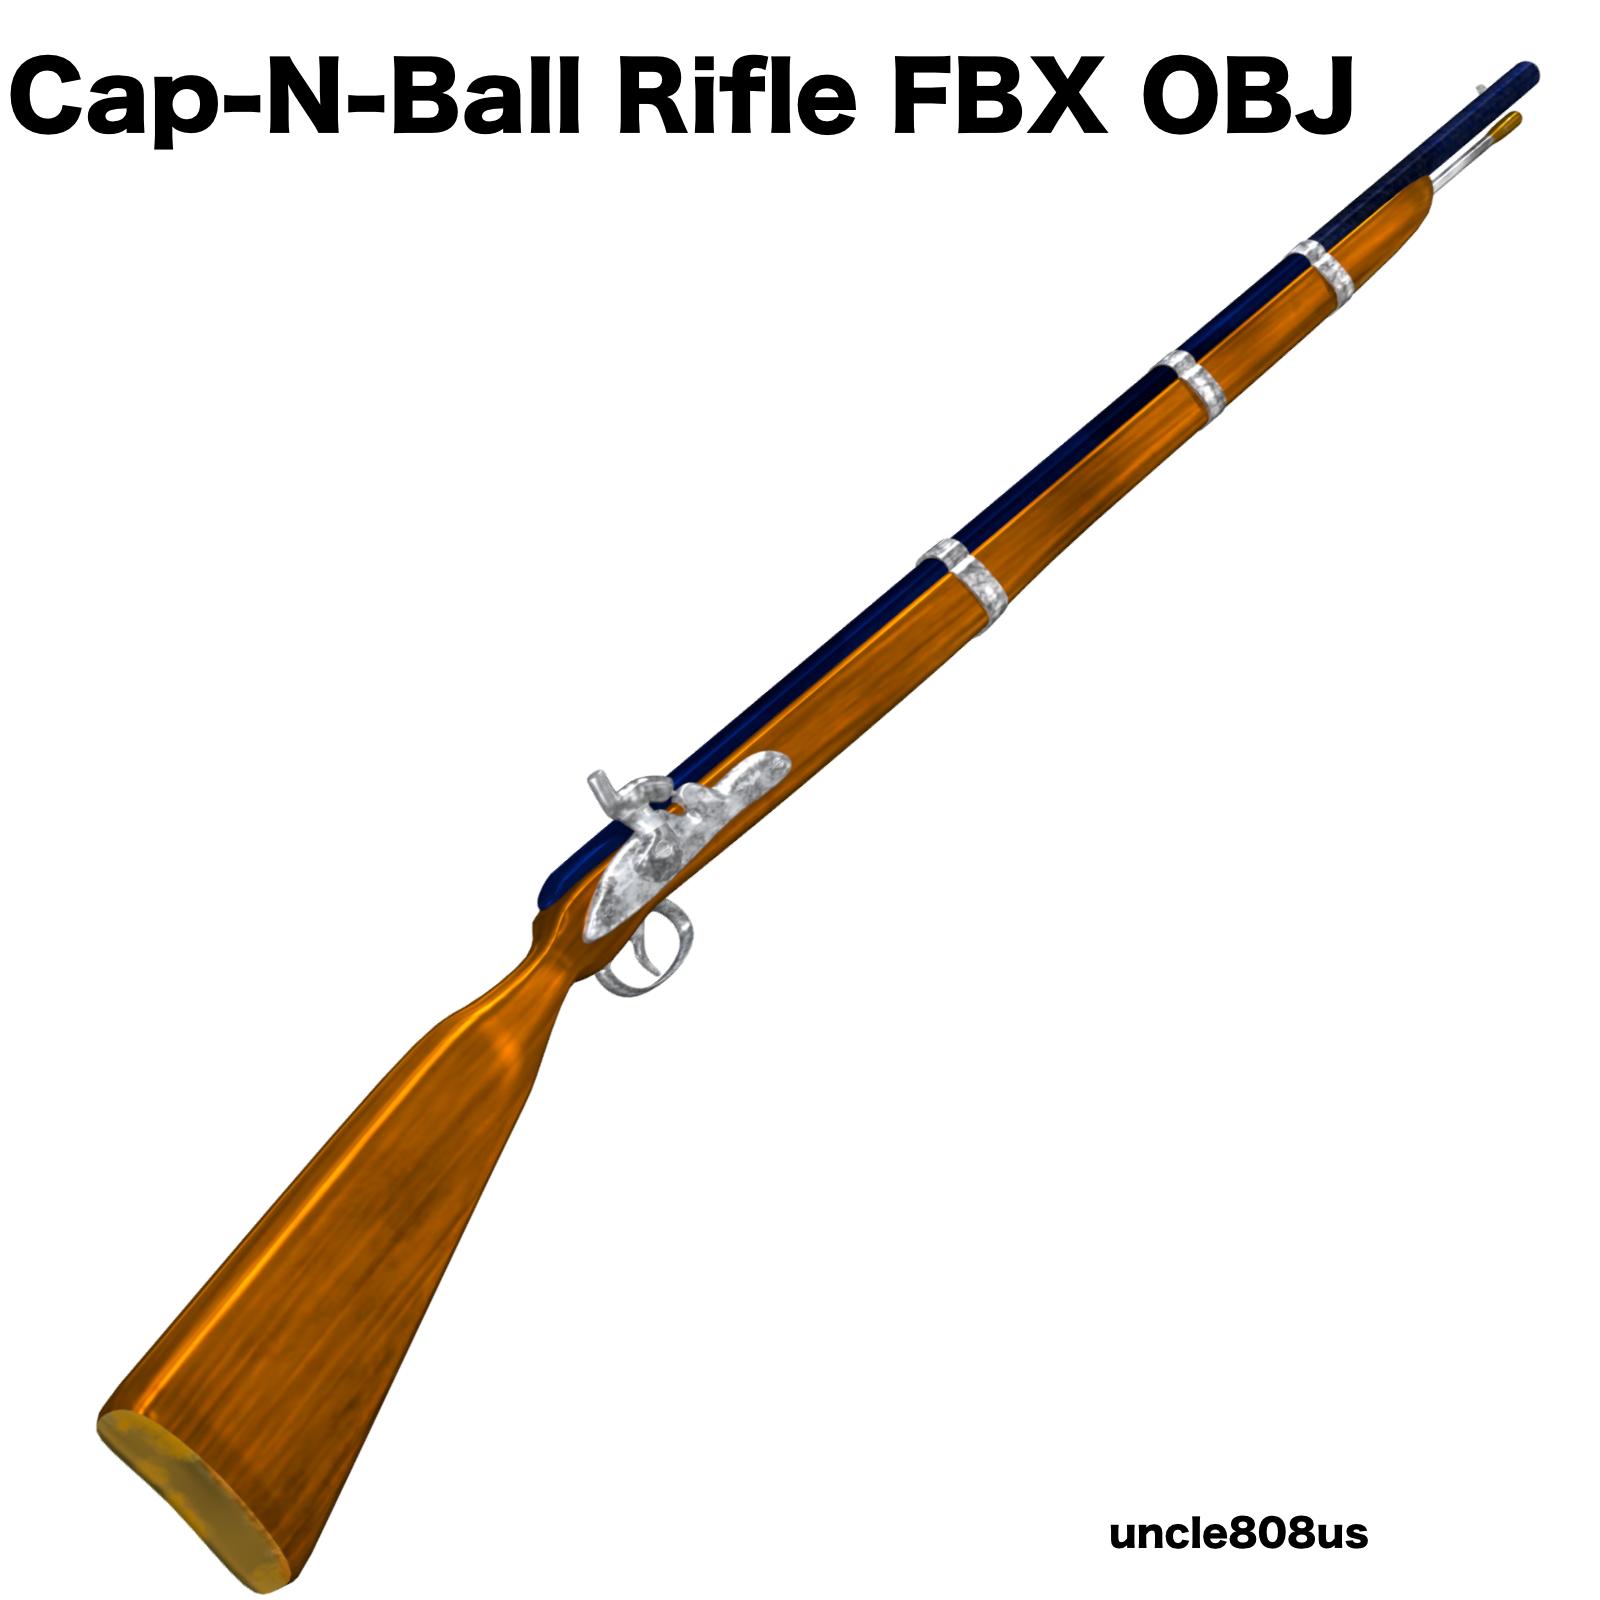 cap-n-ball rifle fbx obj 3d model fbx 220983